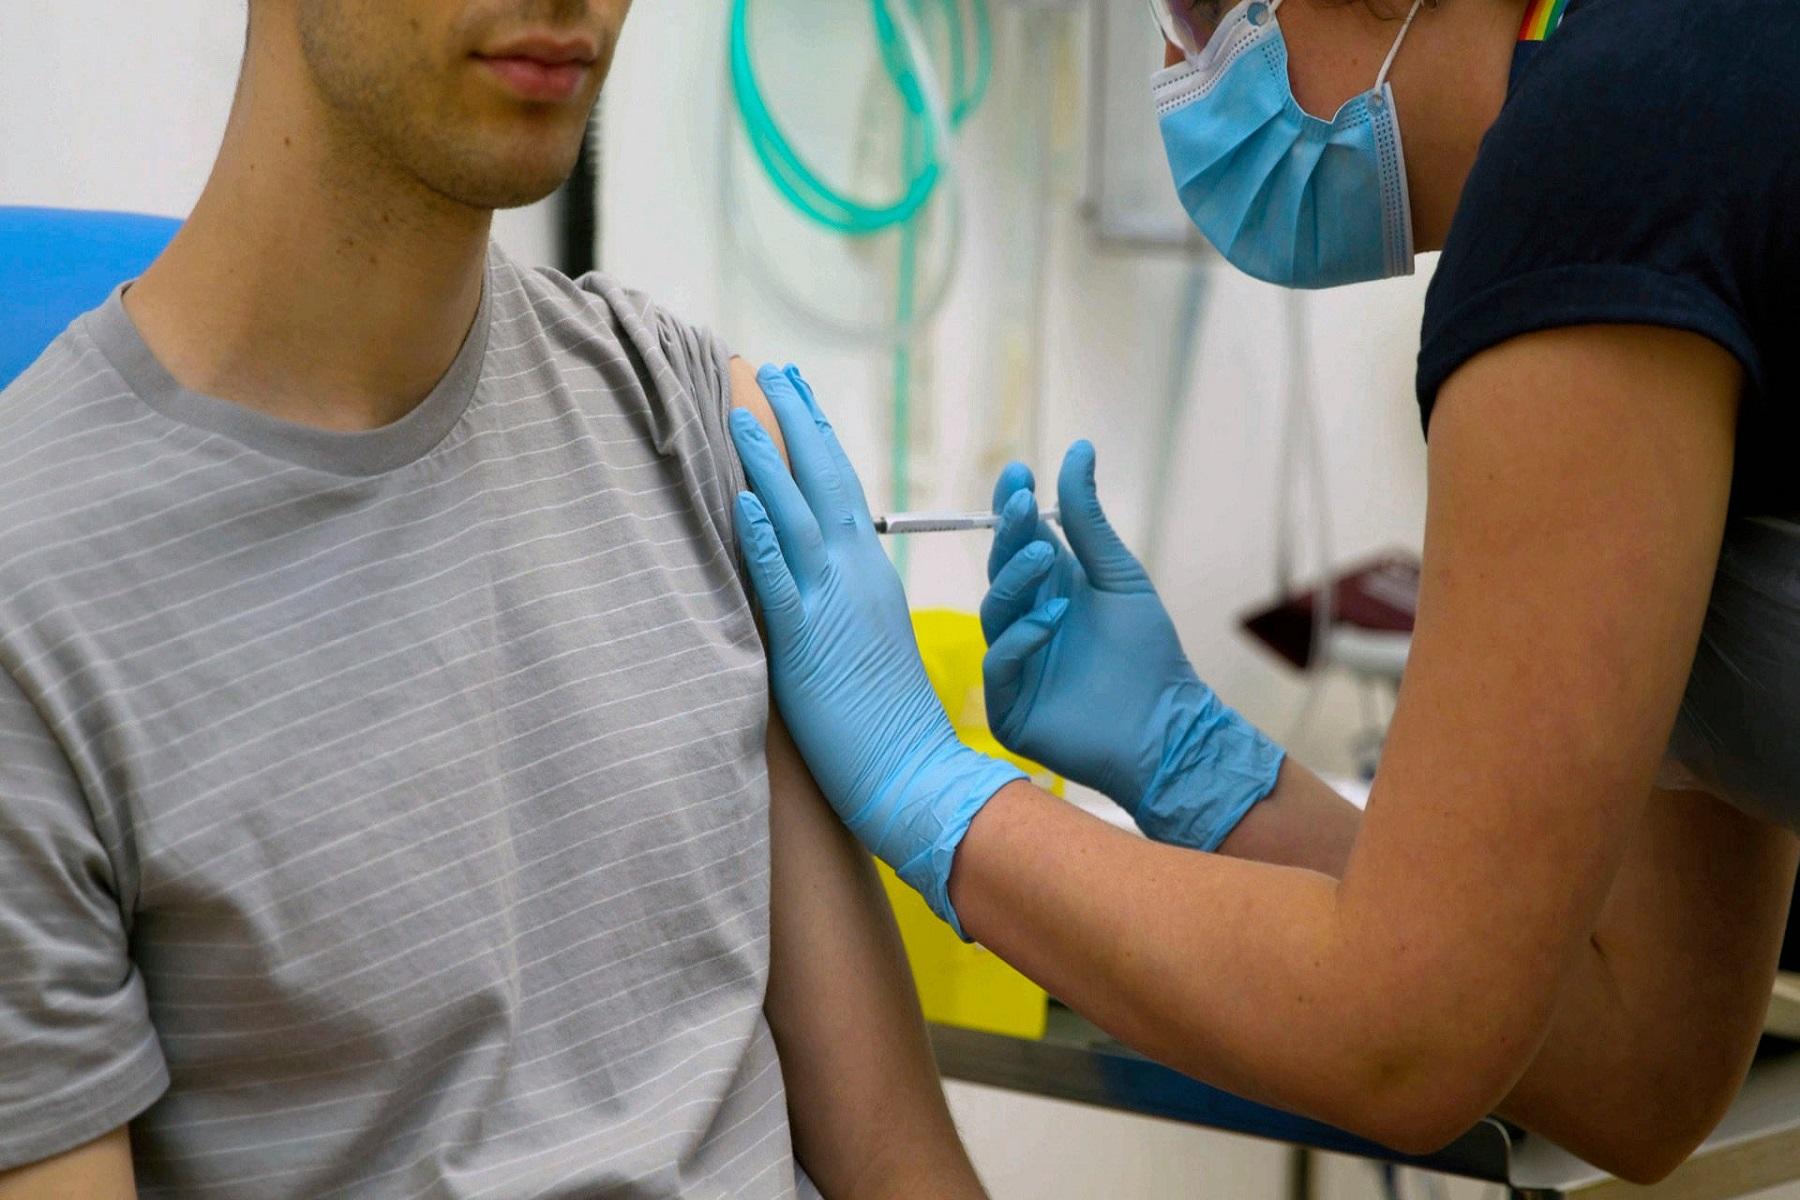 Pfizer/BioNTech και Moderna: Δοκιμή των εμβολίων τους σε εφήβους και παιδιά άνω των 12 ετών